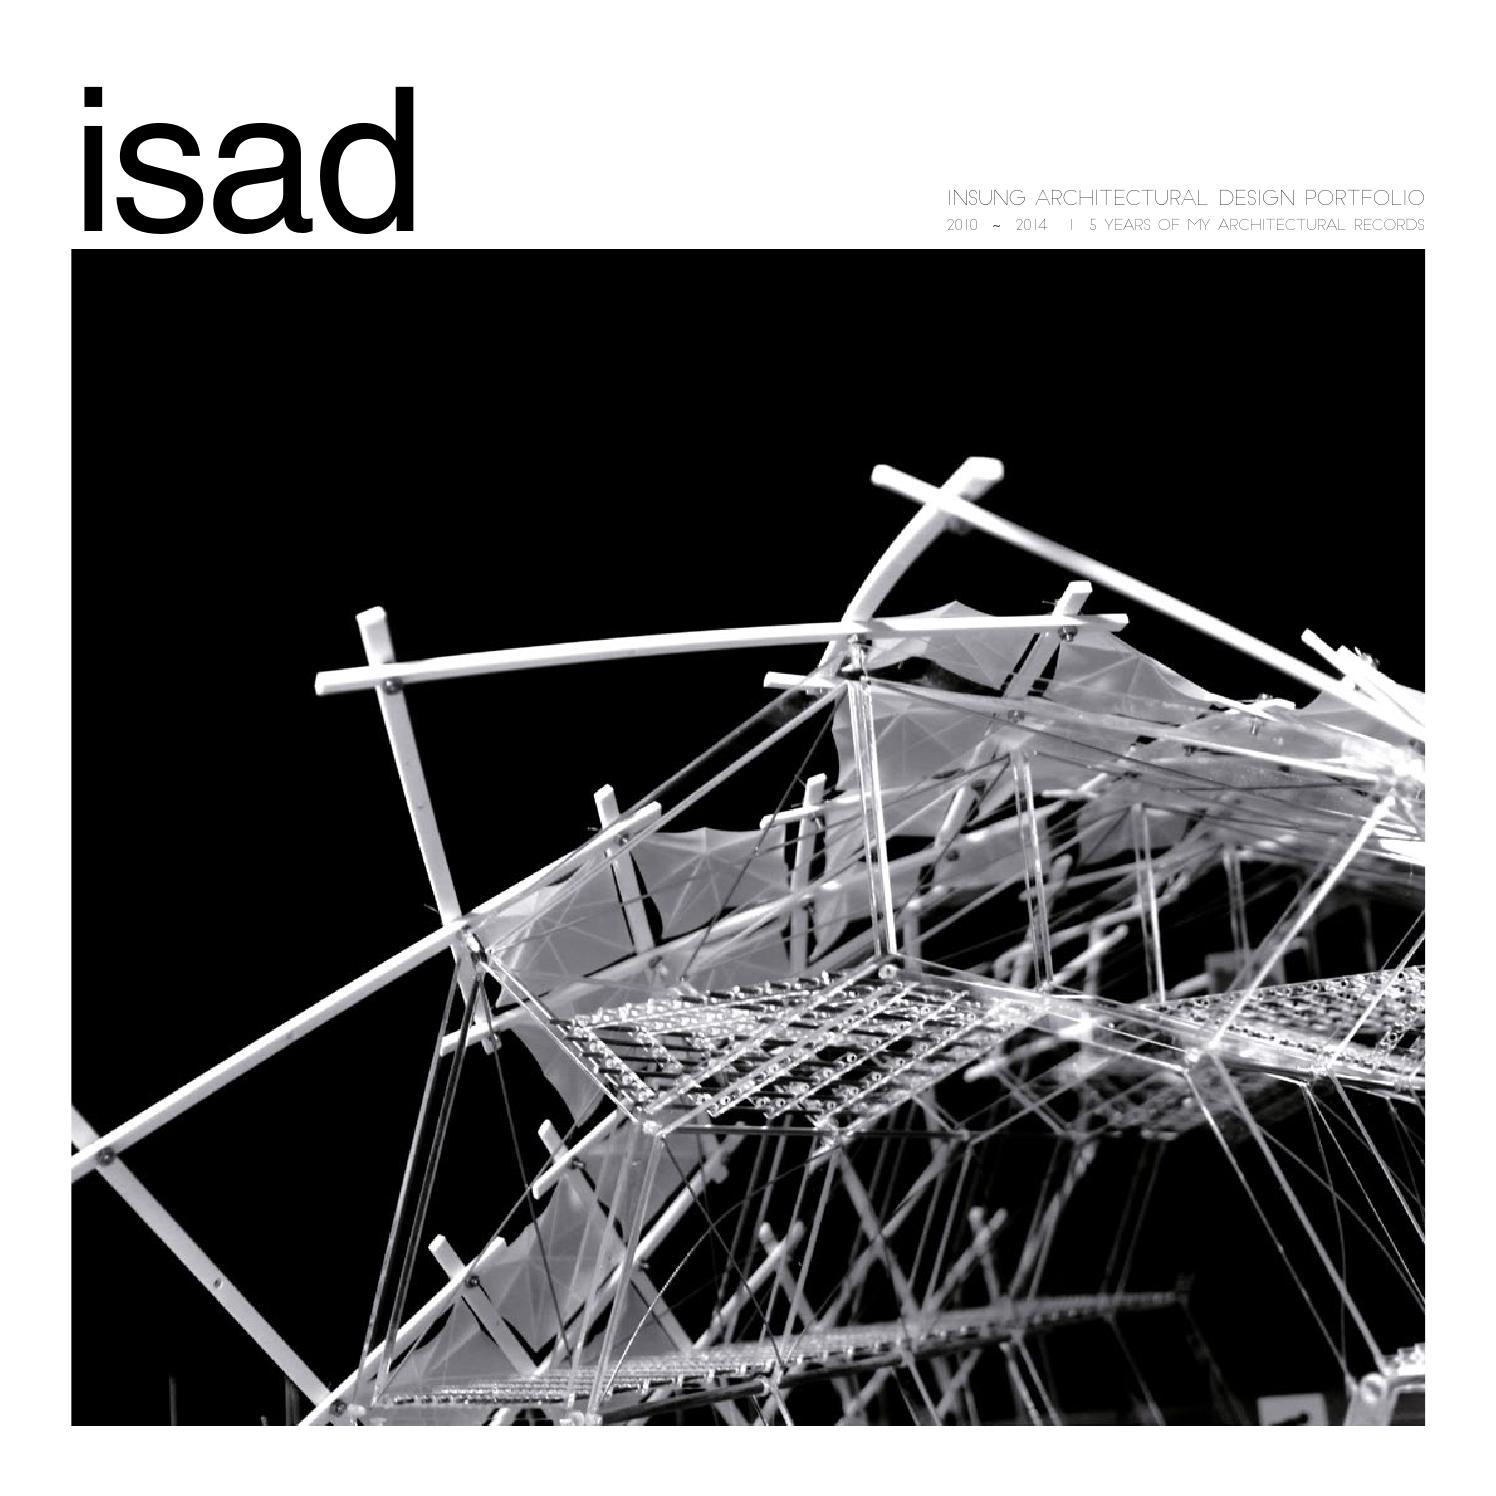 isad architecture portfolio by insung son